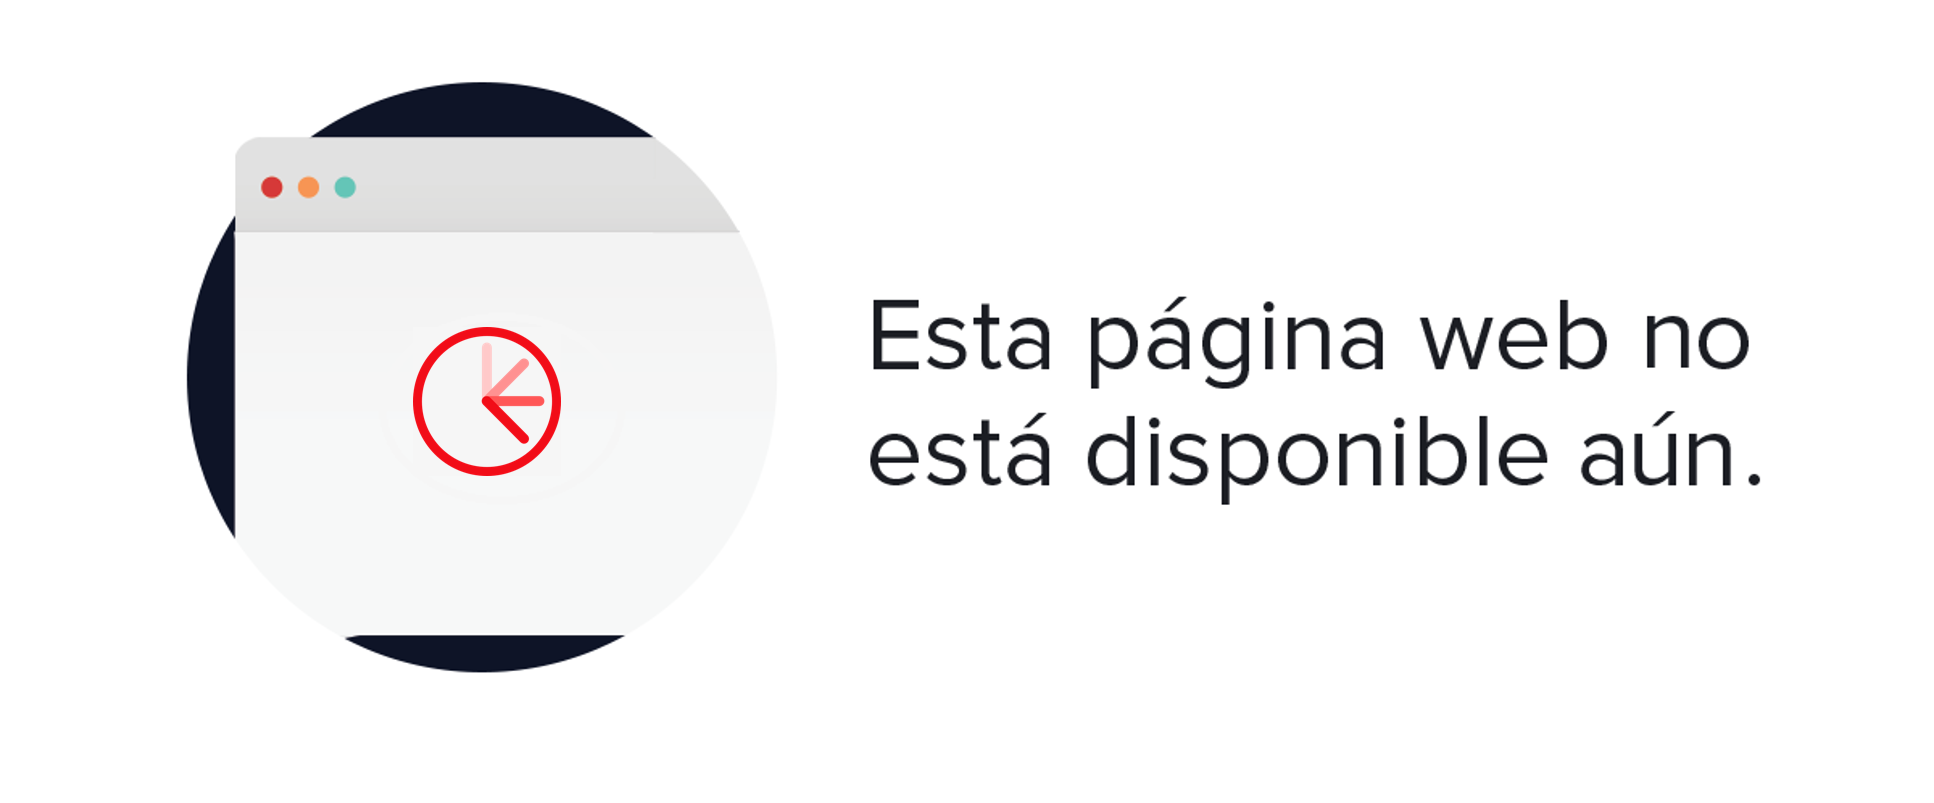 OXXO - Falda de mujer OXXO asimétrica con cintura gomada Gris 8681613245815 - GPKAWCB